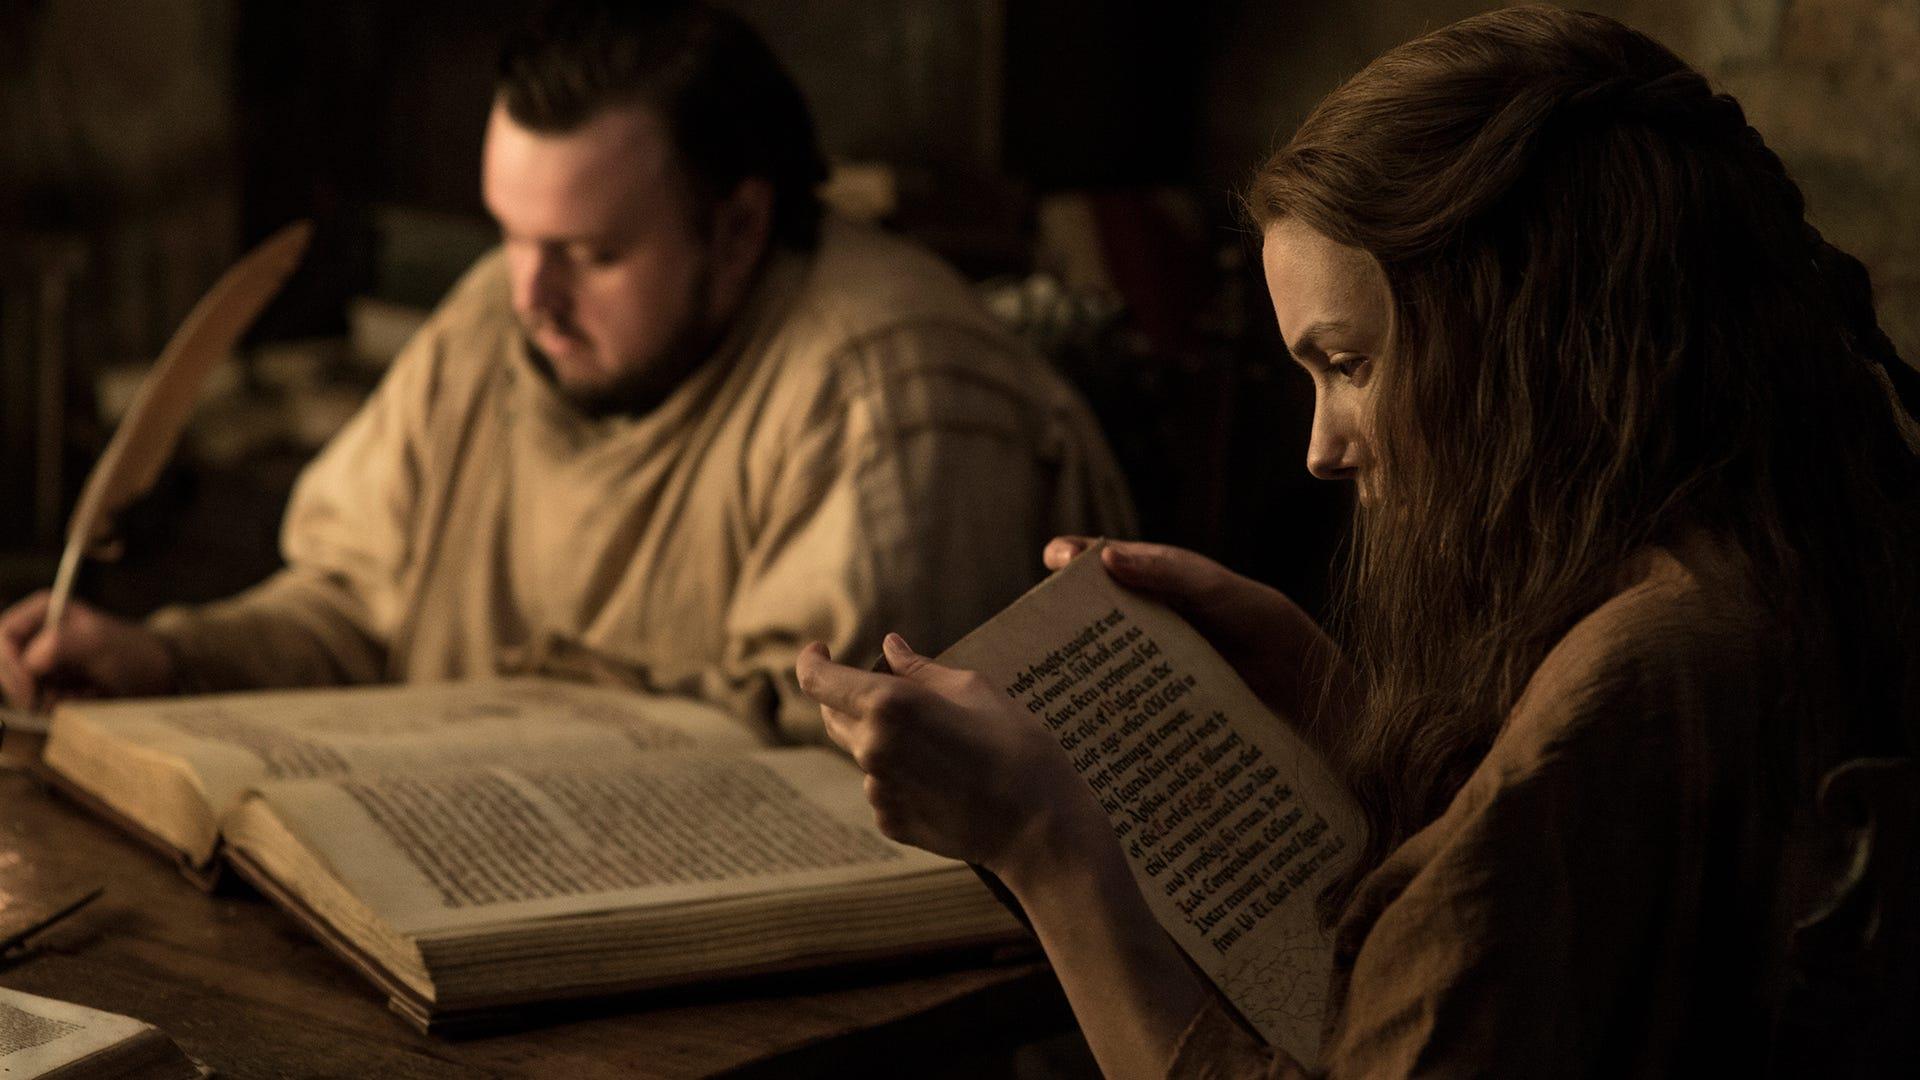 John Bradley, Hannah Murray; Game of Thrones